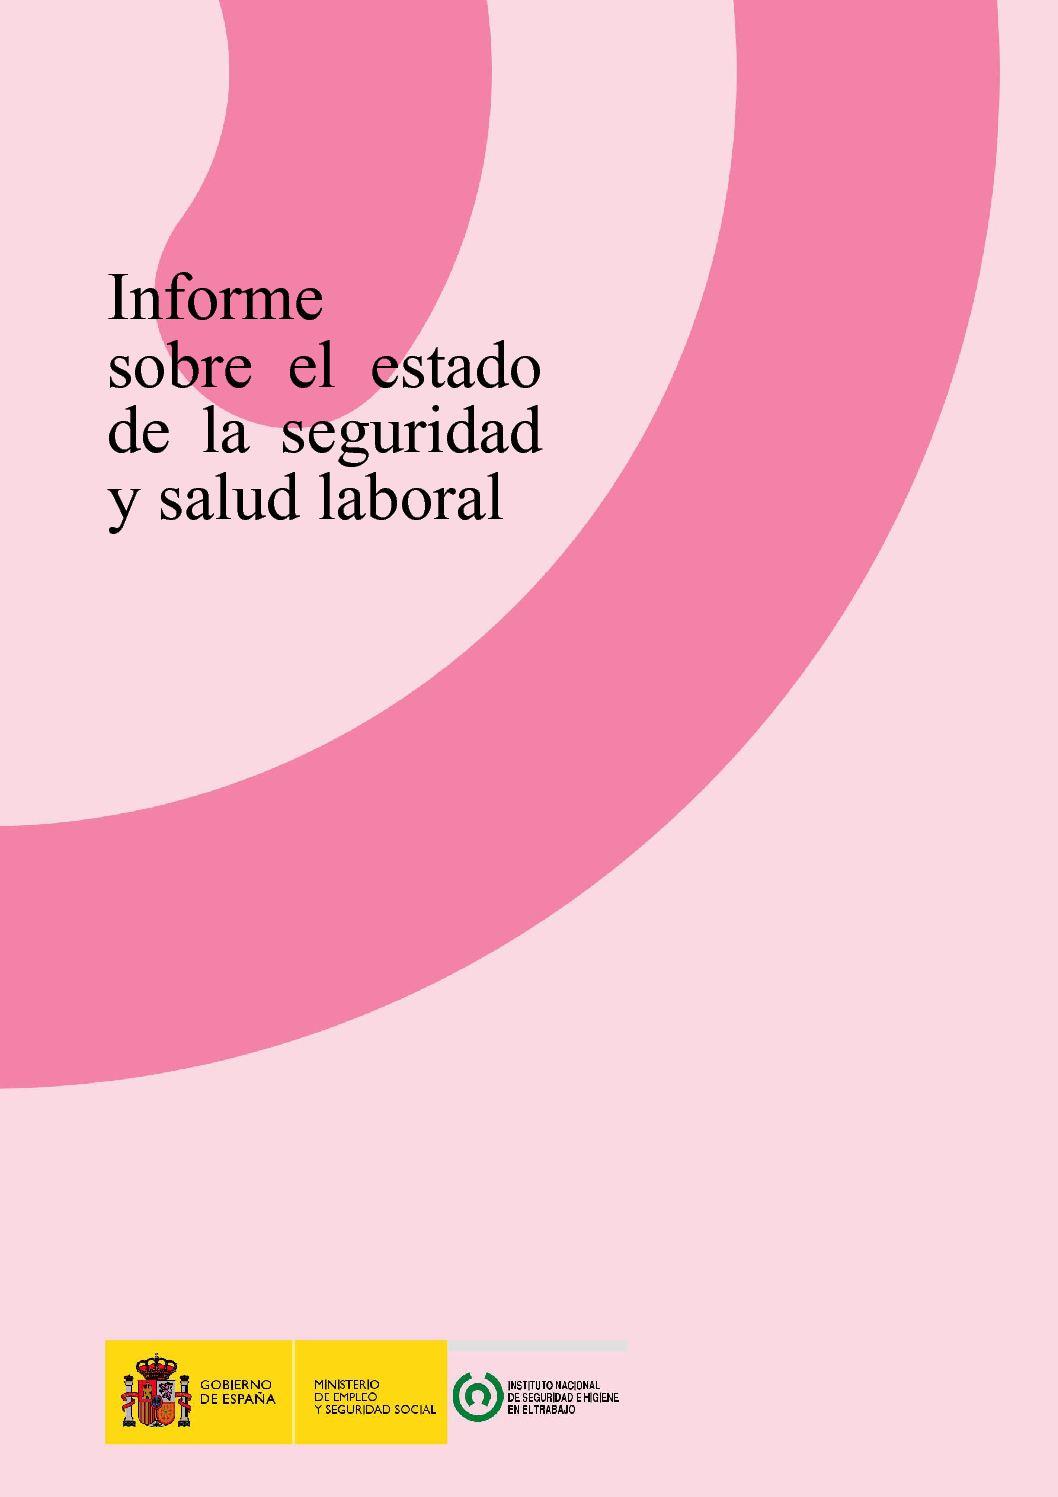 Calendario Escolar 202018 Castilla La Mancha.Calameo Informe Ss 2014 1